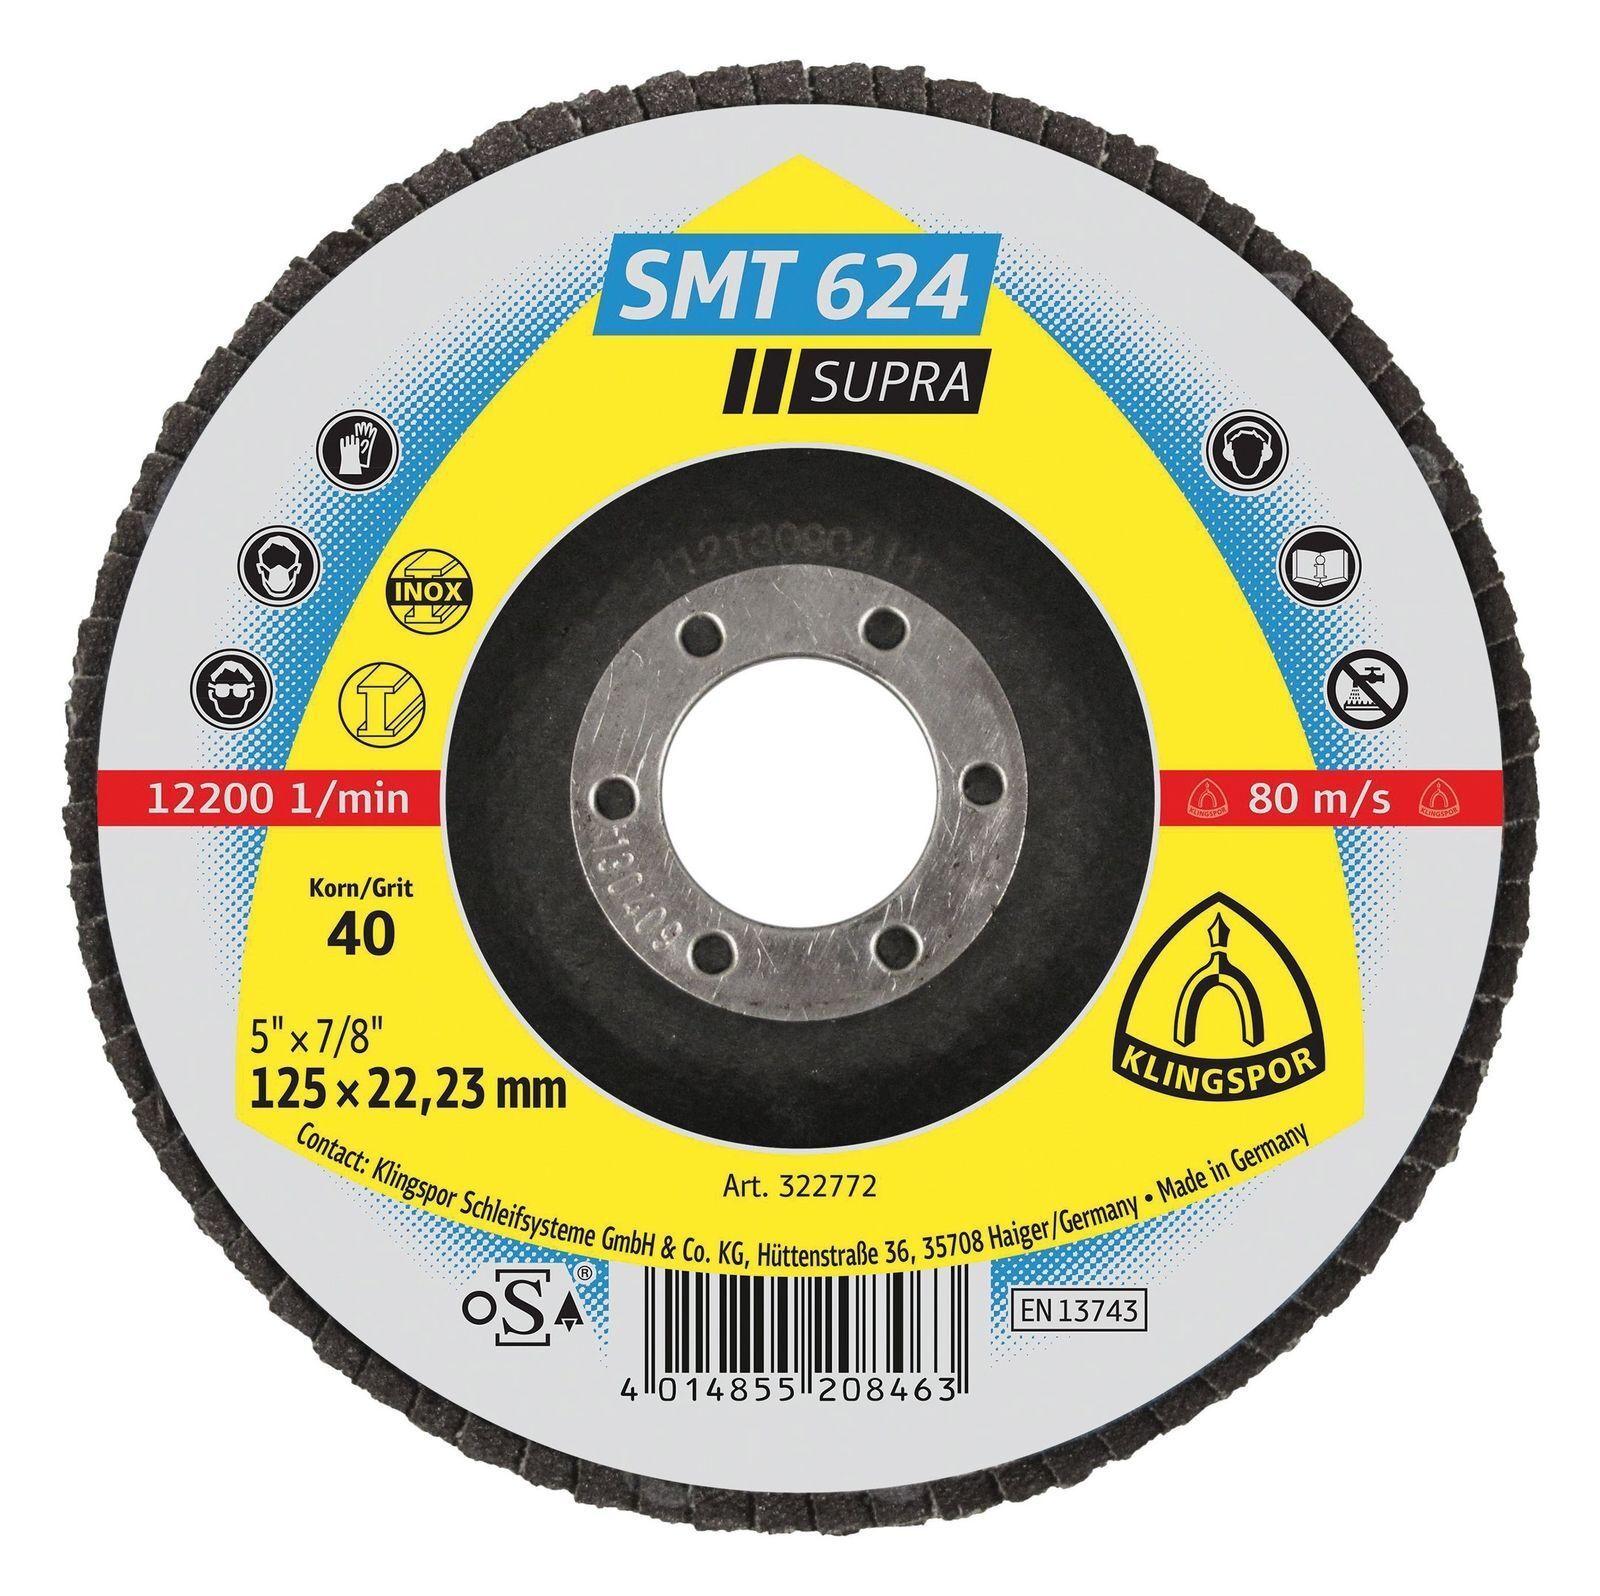 Klingspor Schleifmopteller Supra SMT 624 125mm K40 gewölbt (322772) -50 Stk-